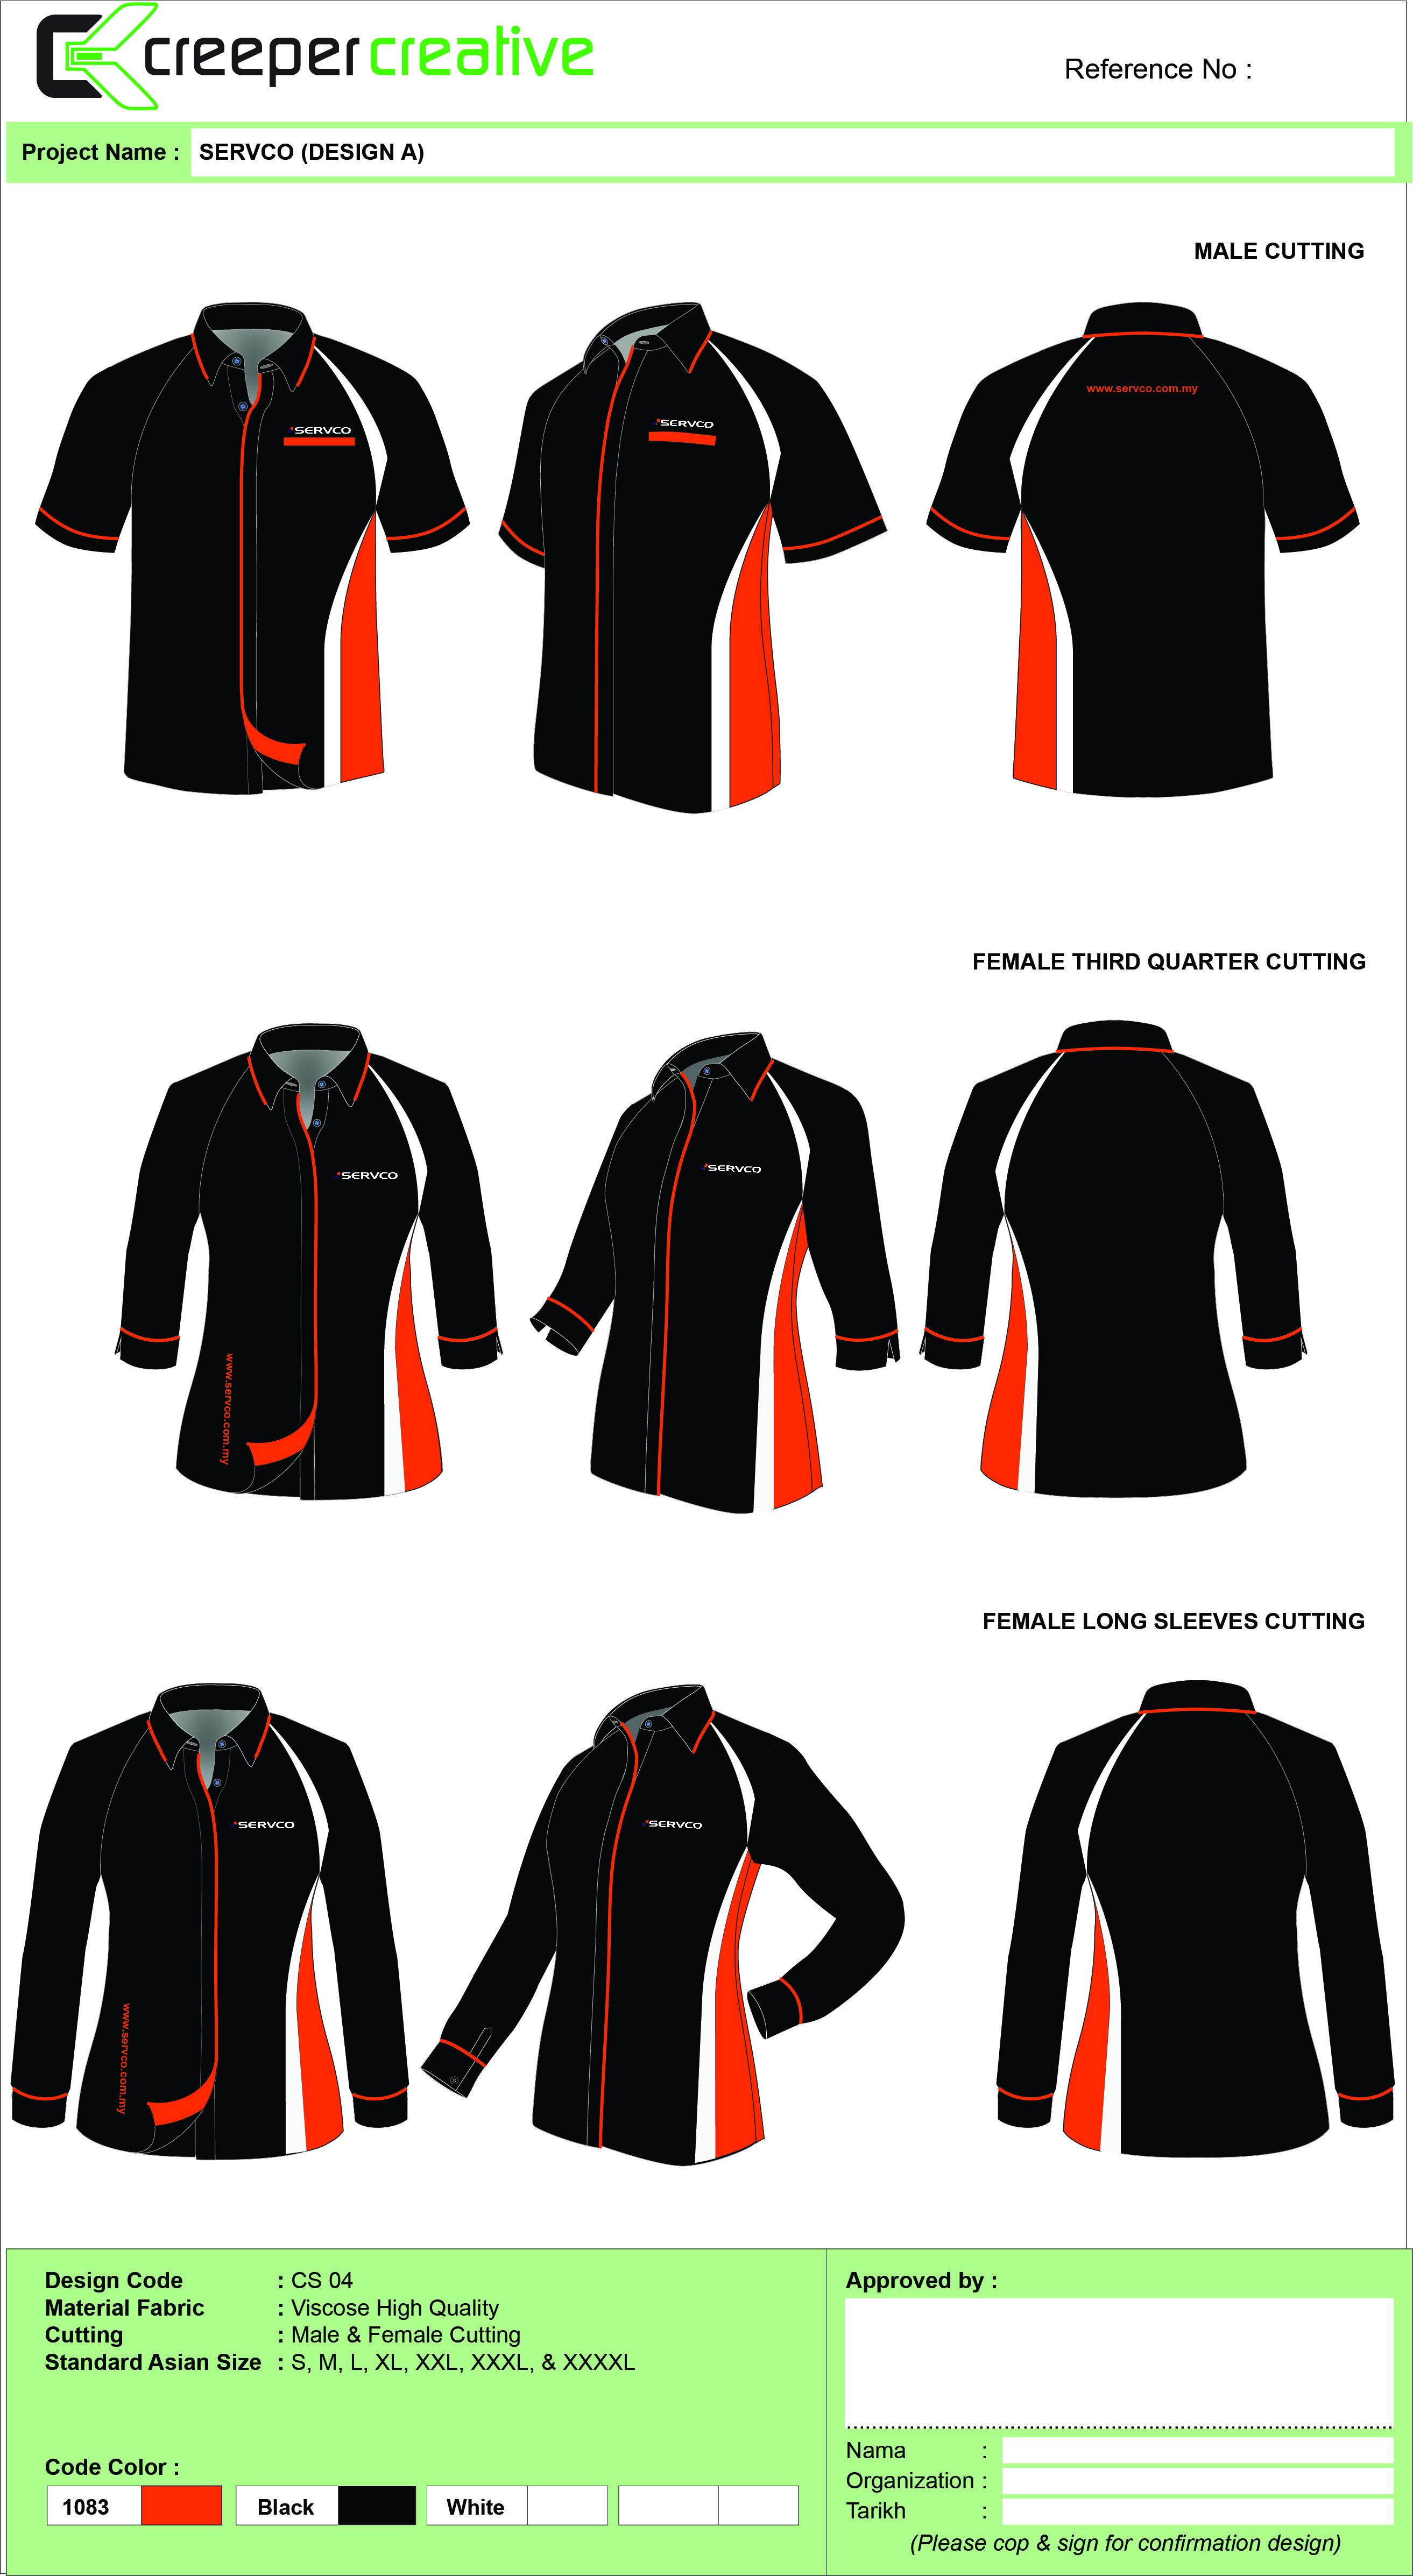 SERVCO CORPORATE SHIRT DESIGN PROPOSAL EDIT 1 Corporate Shirts Corporate Uniforms fice Outfits Women